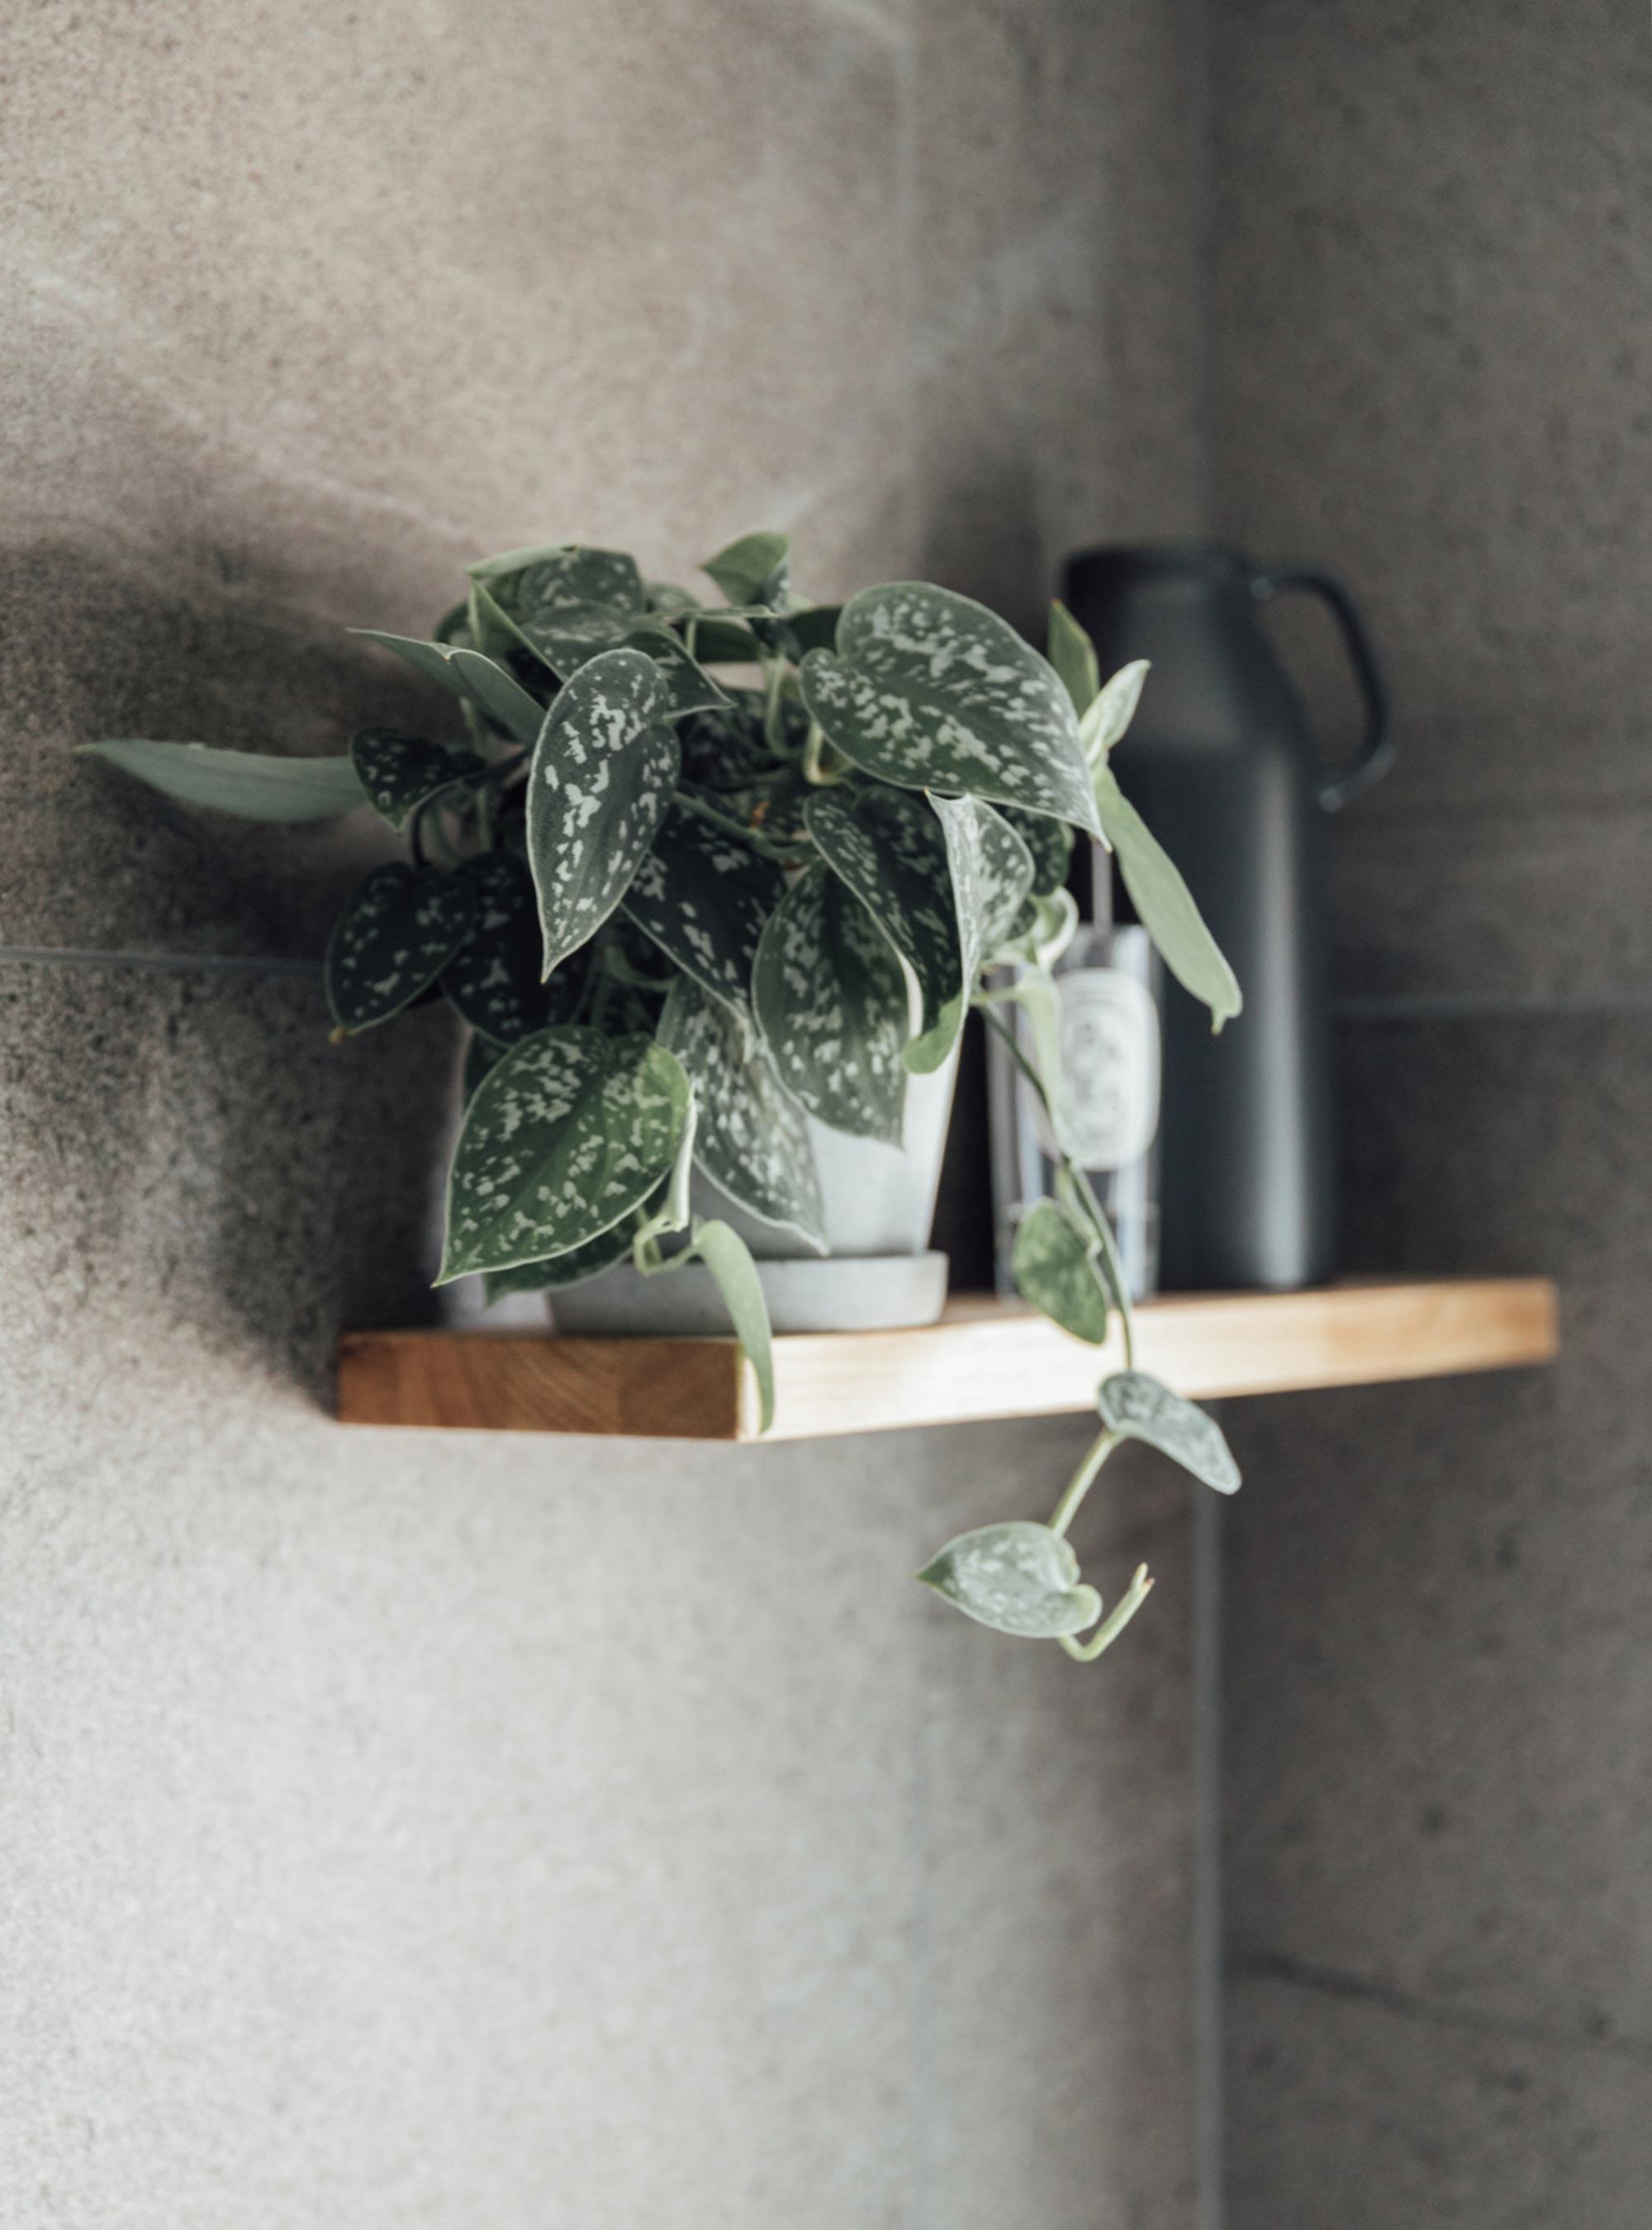 9 bathroom-shelf-plant-in-concrete-pot.jpg